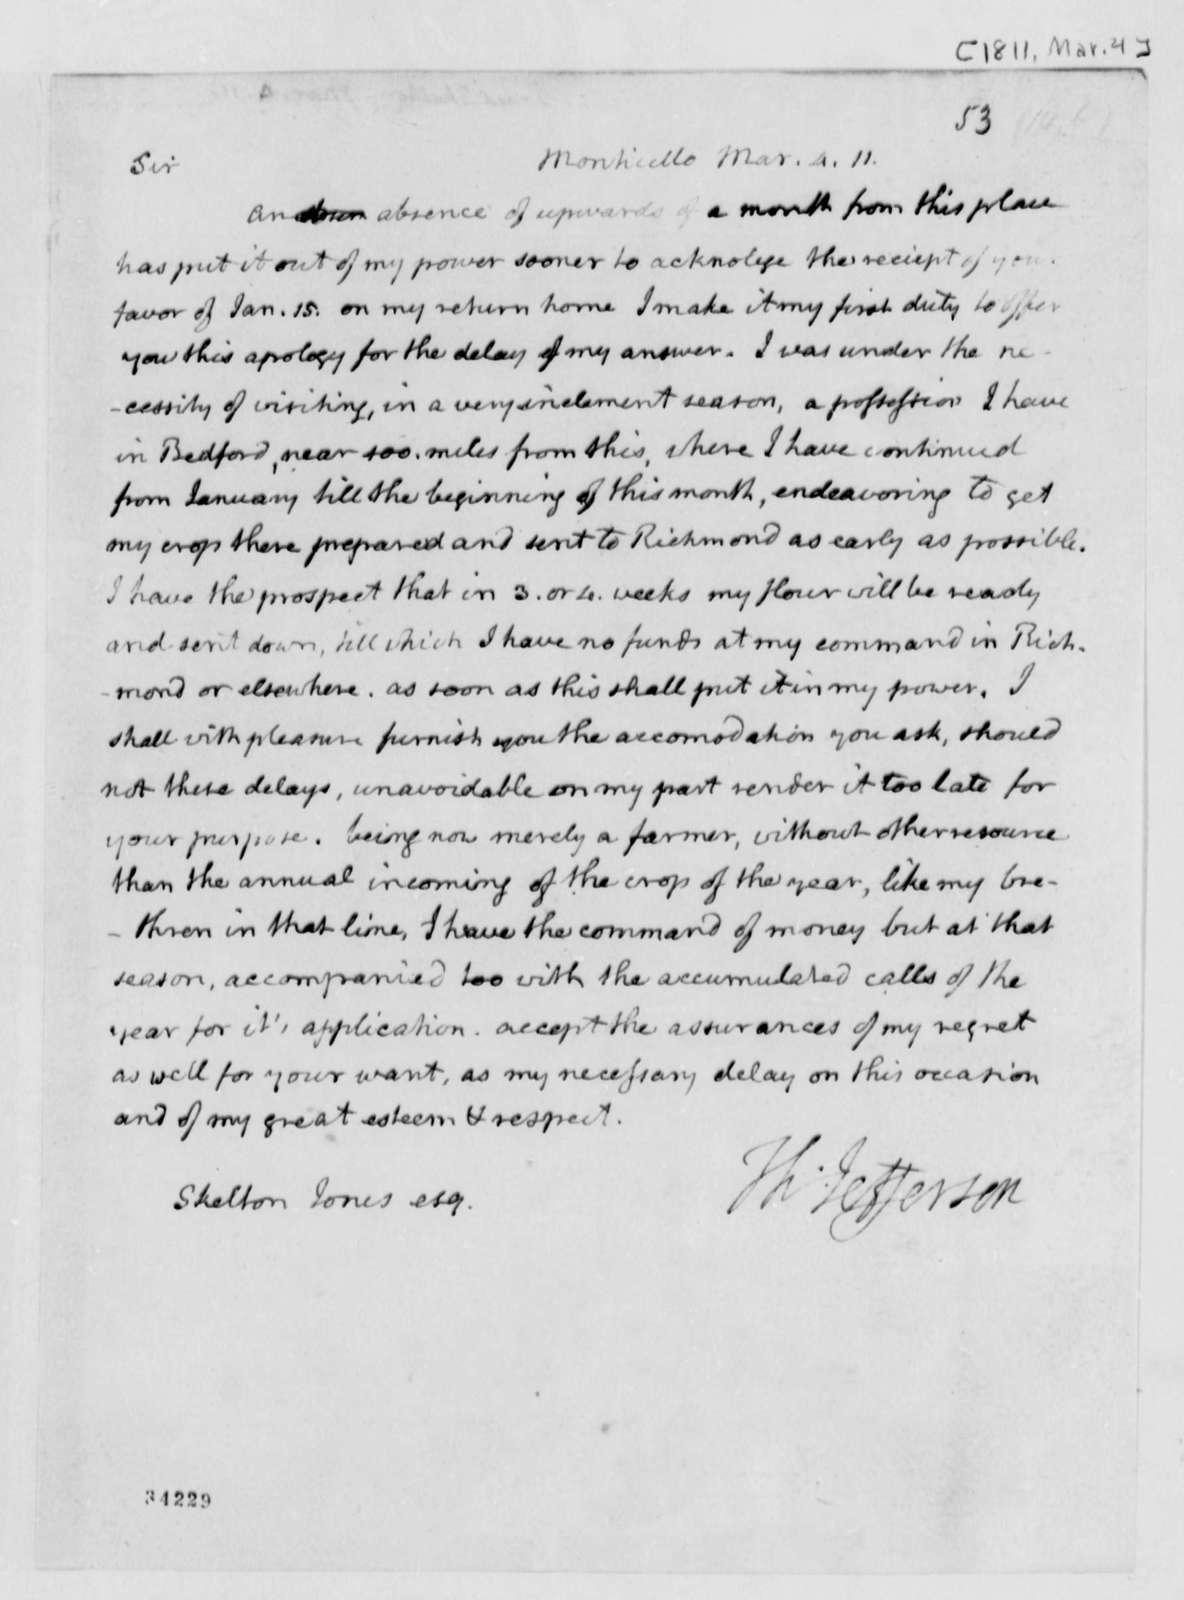 Thomas Jefferson to Skelton Jones, March 4, 1811